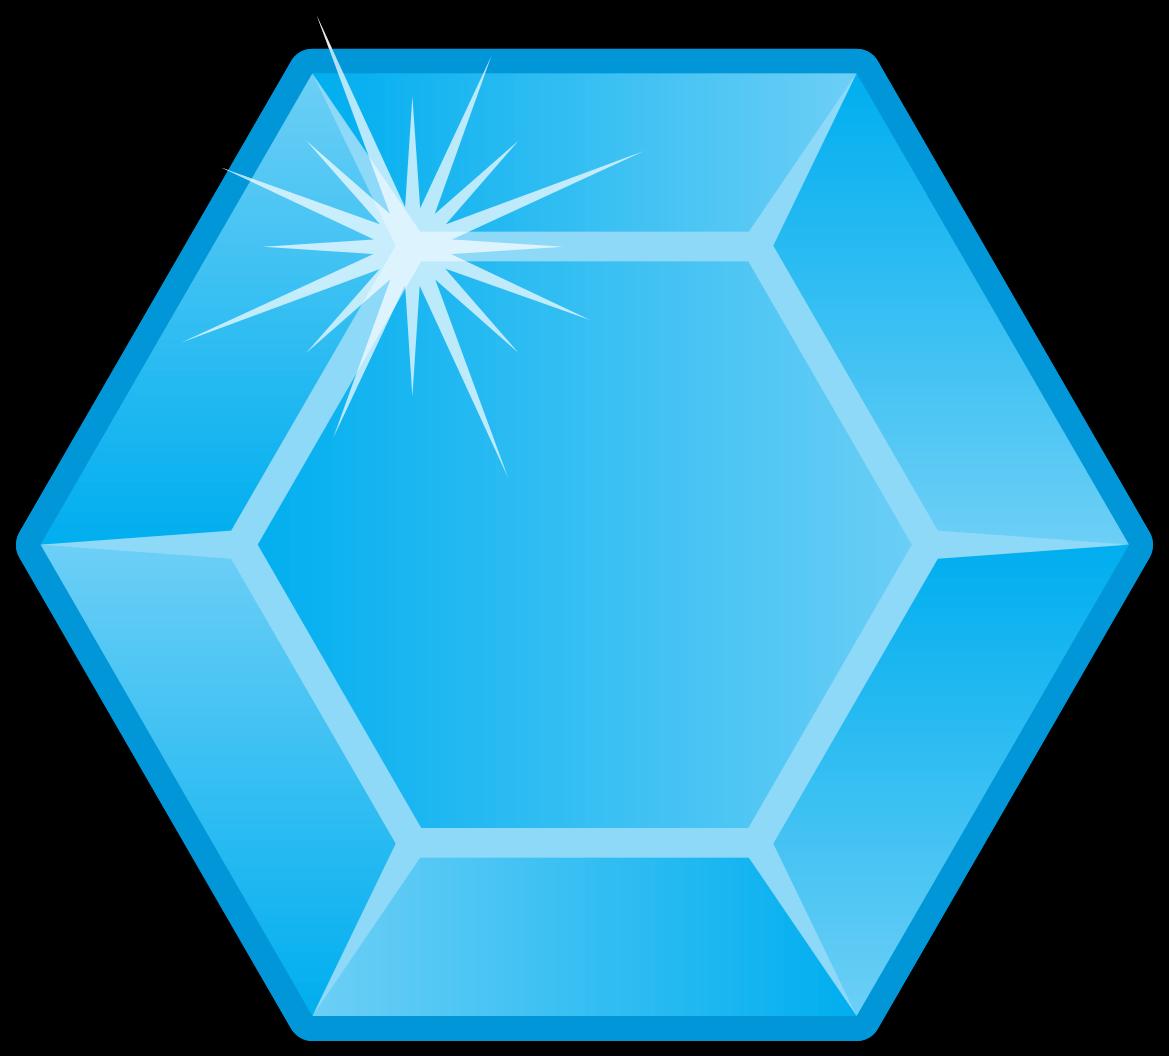 Blue Diamond Hexagon png